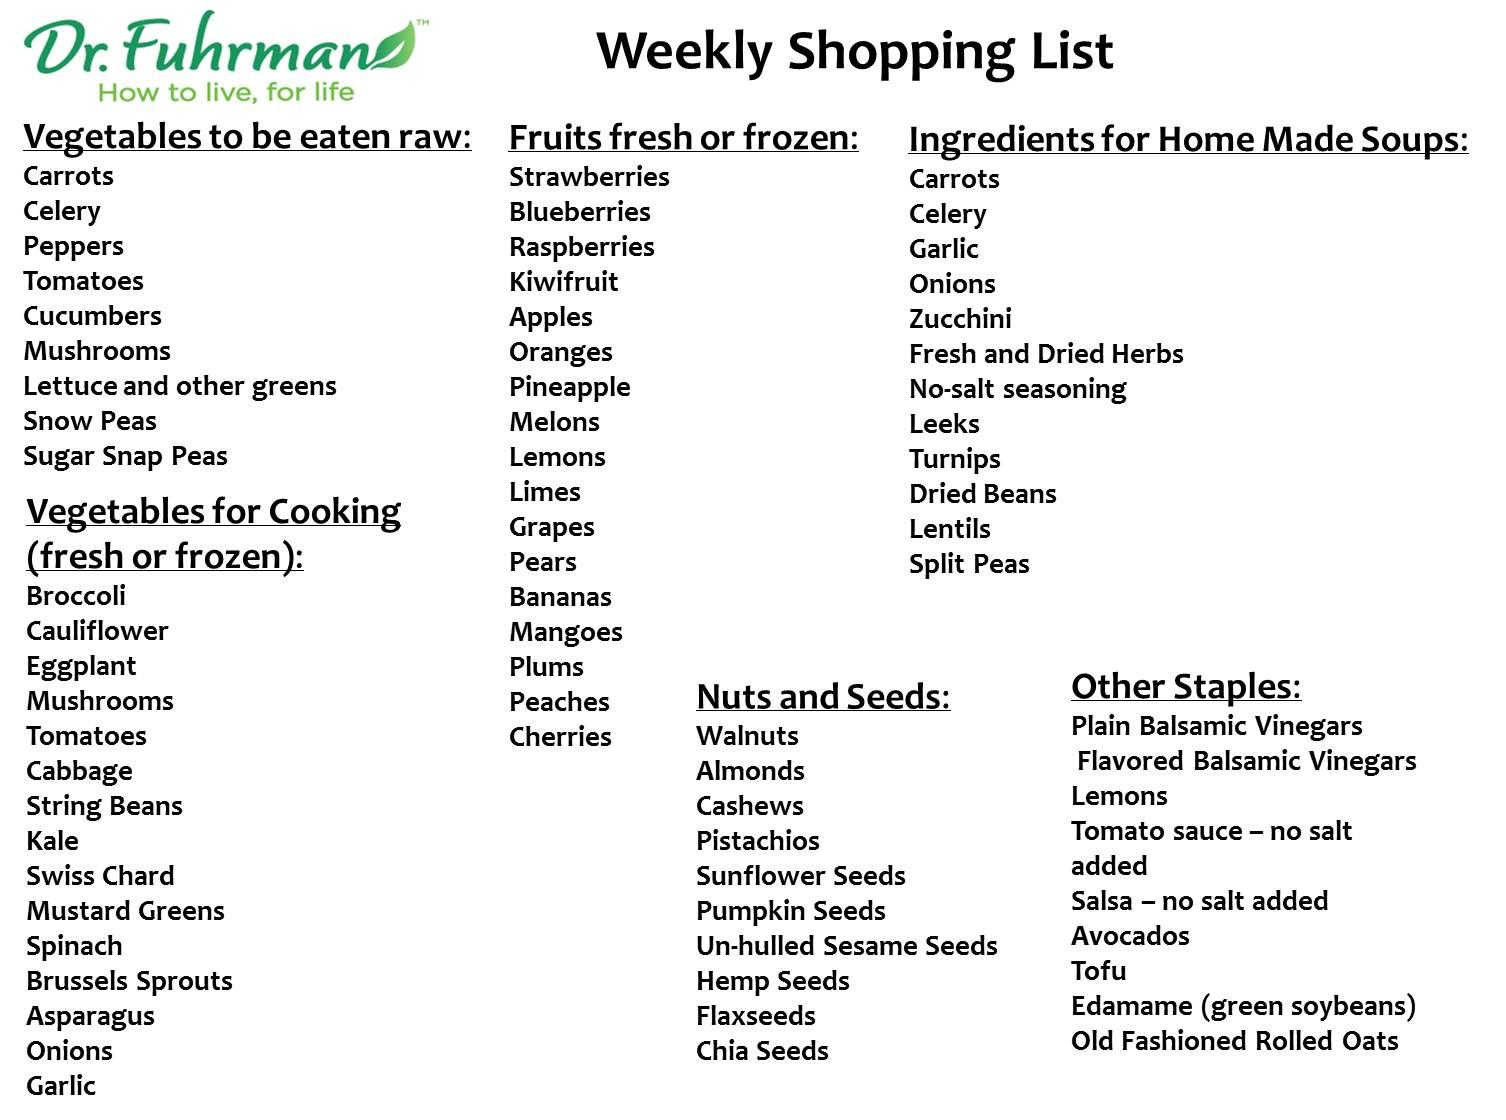 Doctor's Tip: Dr. Fuhrman's nutritarian diet